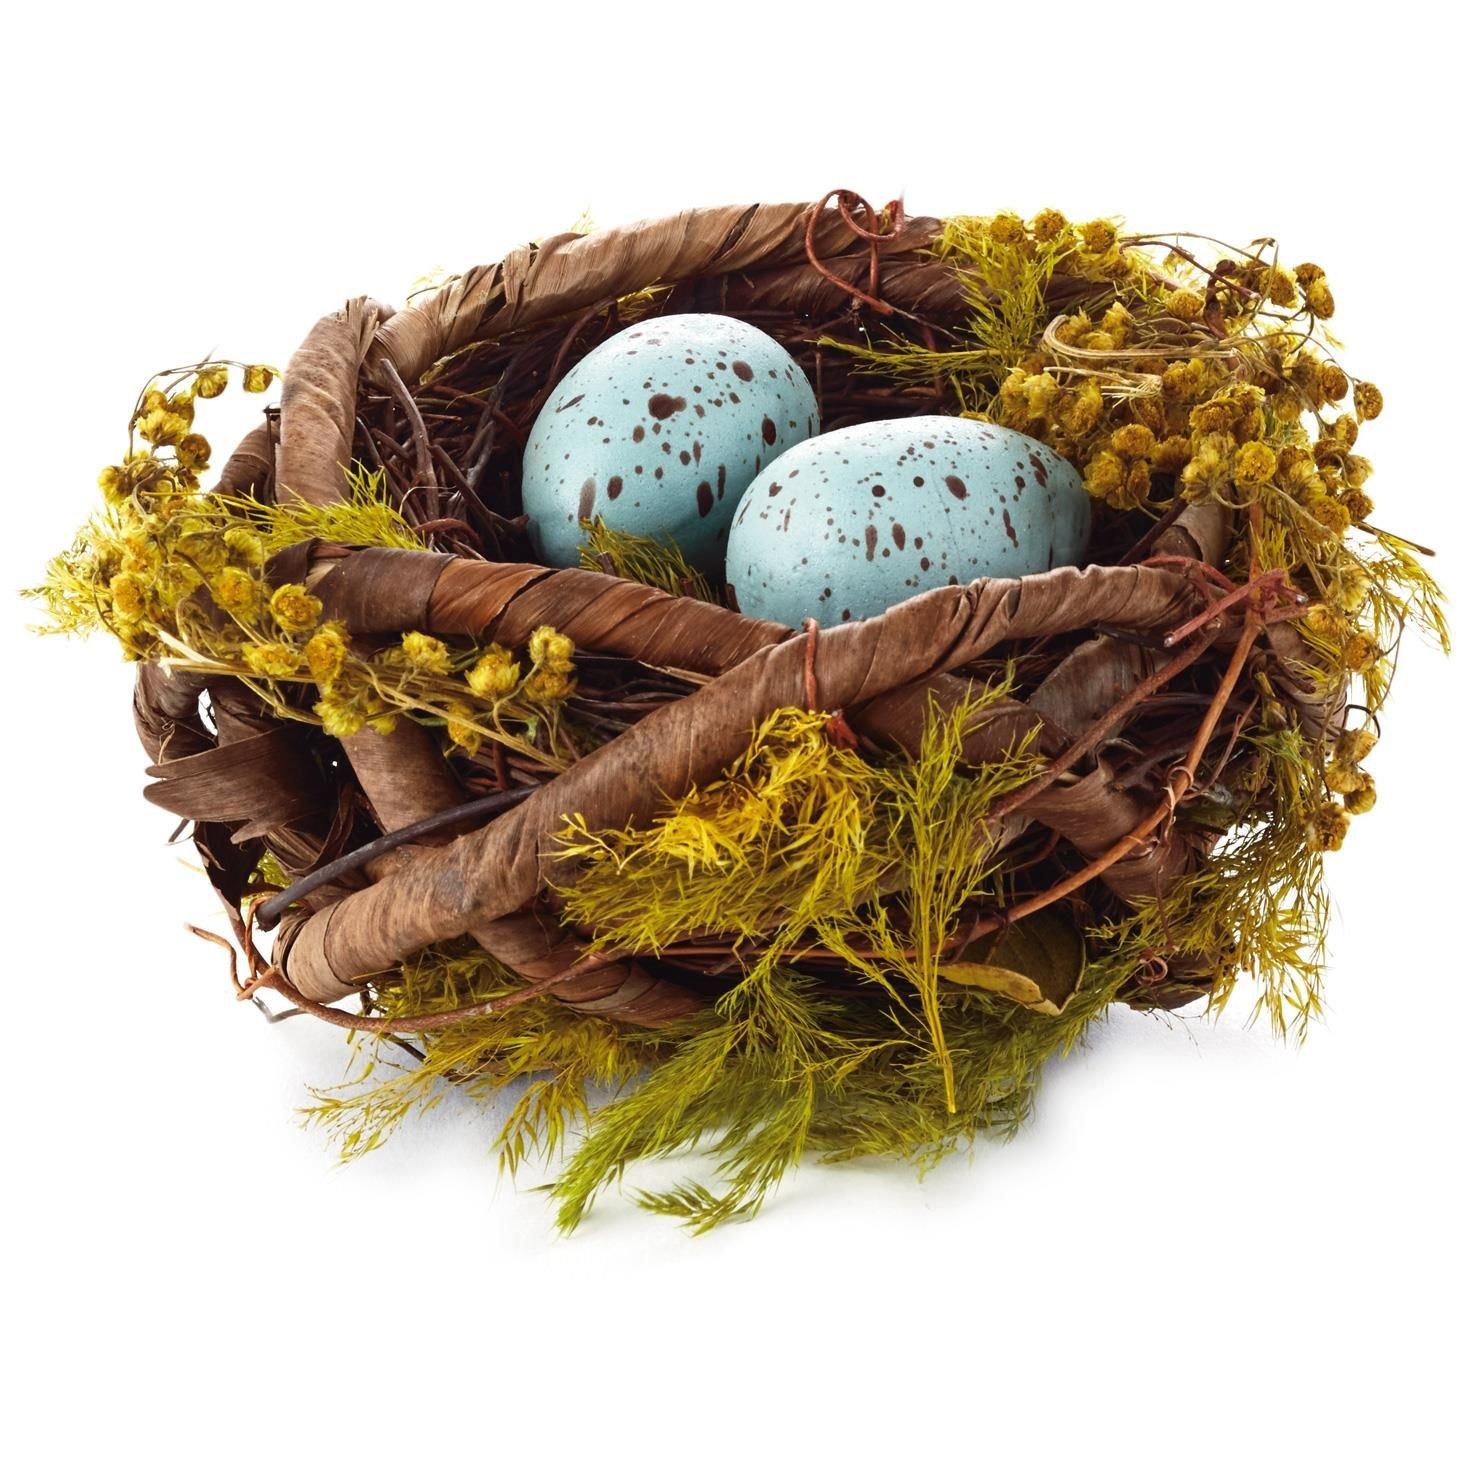 Blue Robins' Eggs in Nest Decoration Decorative Accessories Animals & Nature